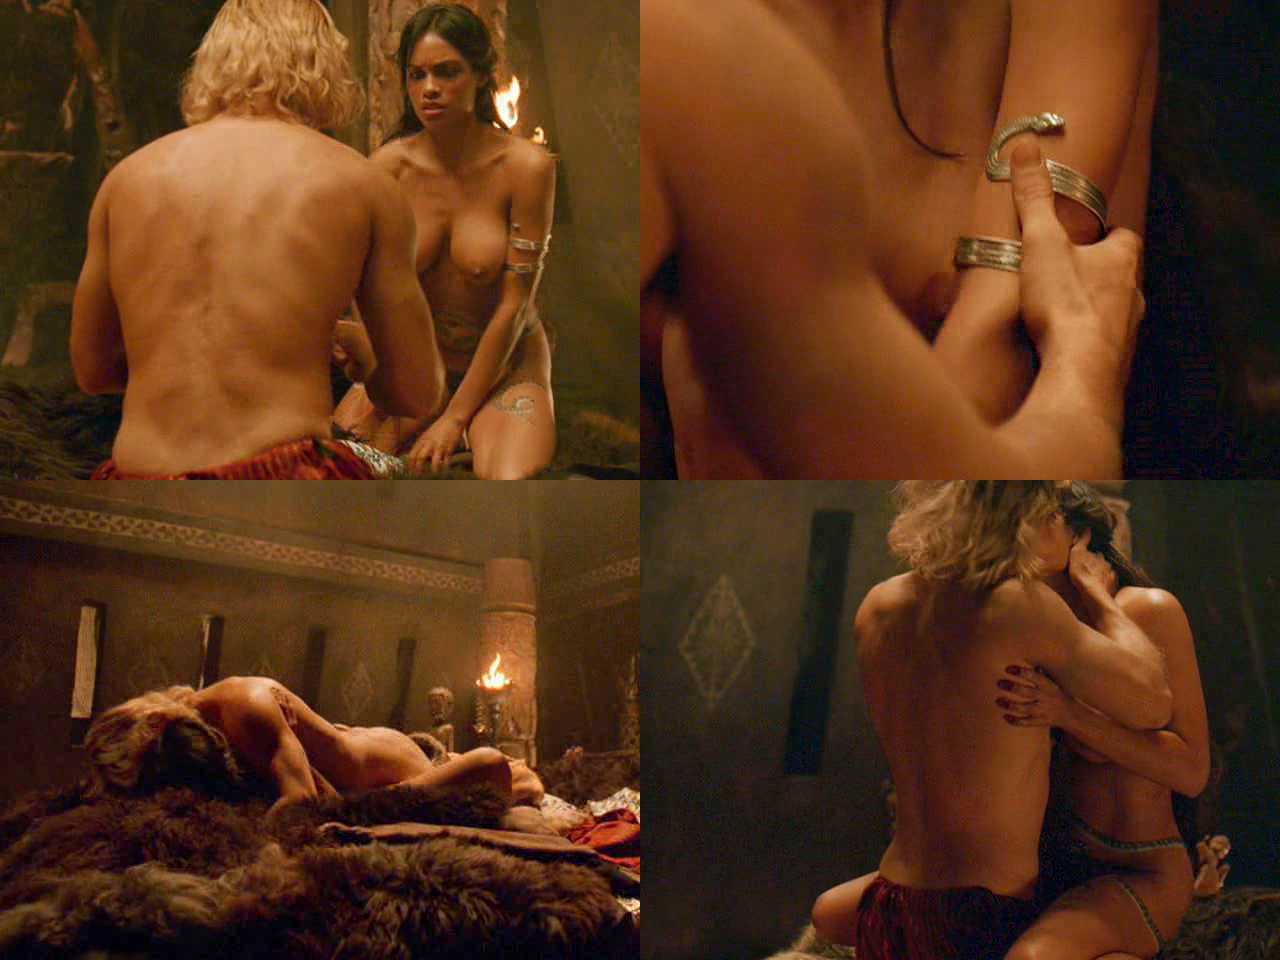 Seducing nude girls pics